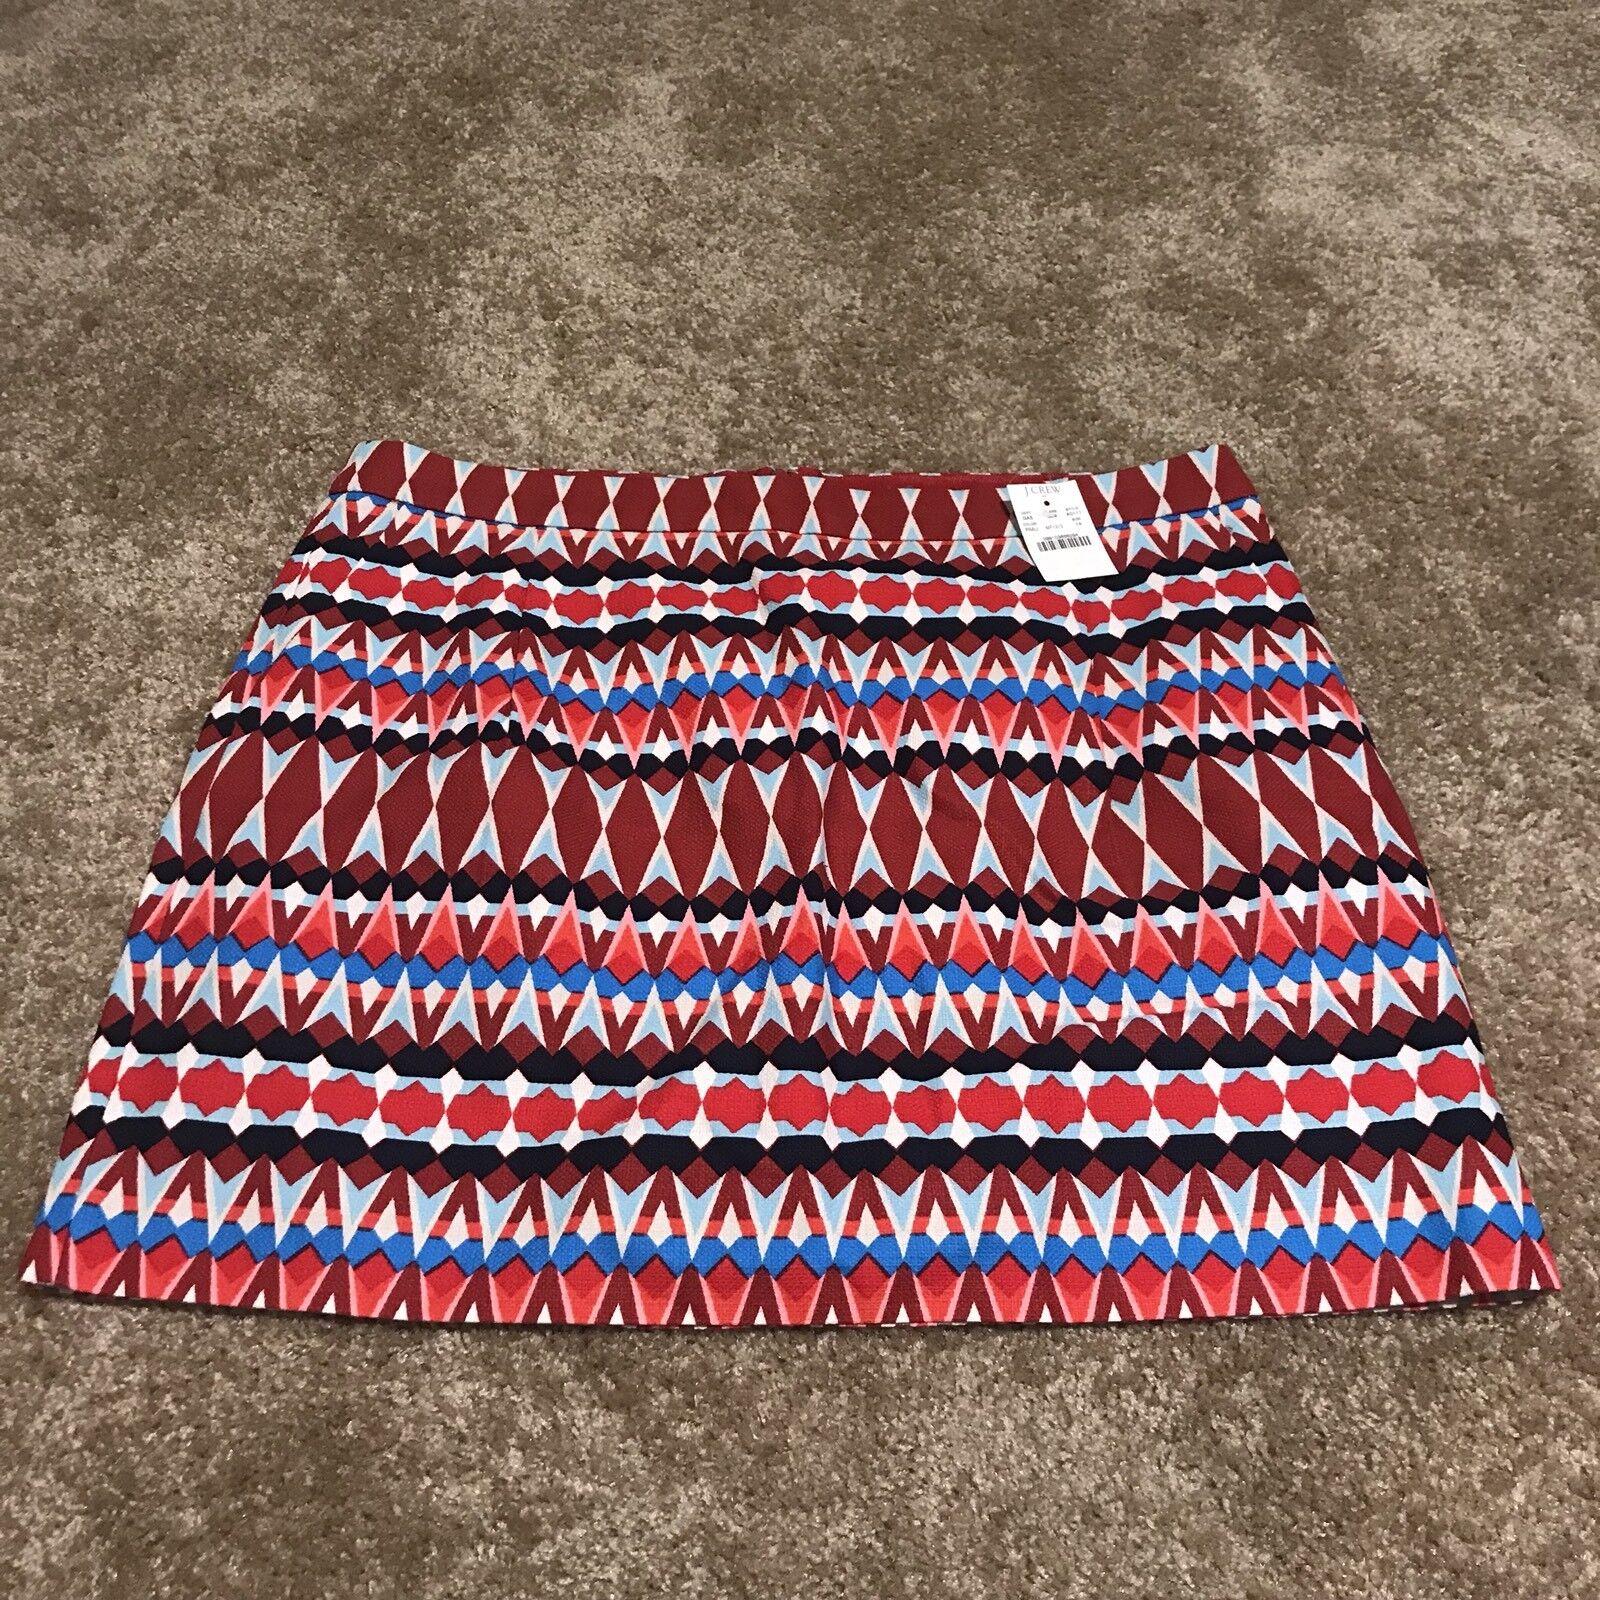 J.Crew Tribal Print Skirt SZ 14 NWT